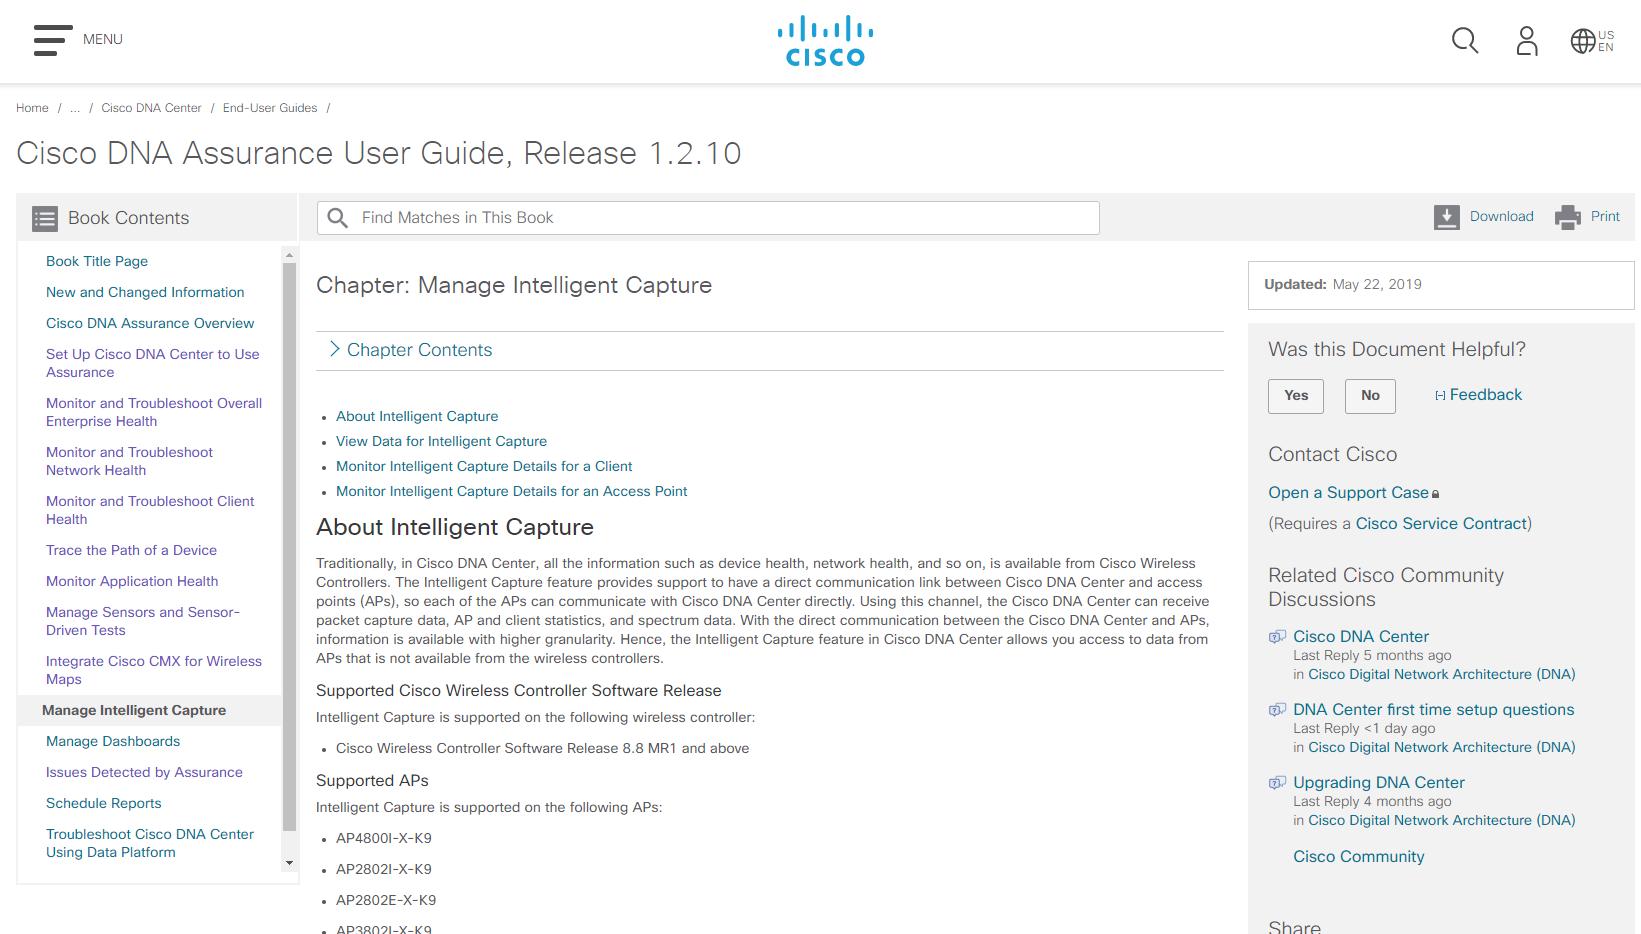 Guide] Manage Intelligent Capture